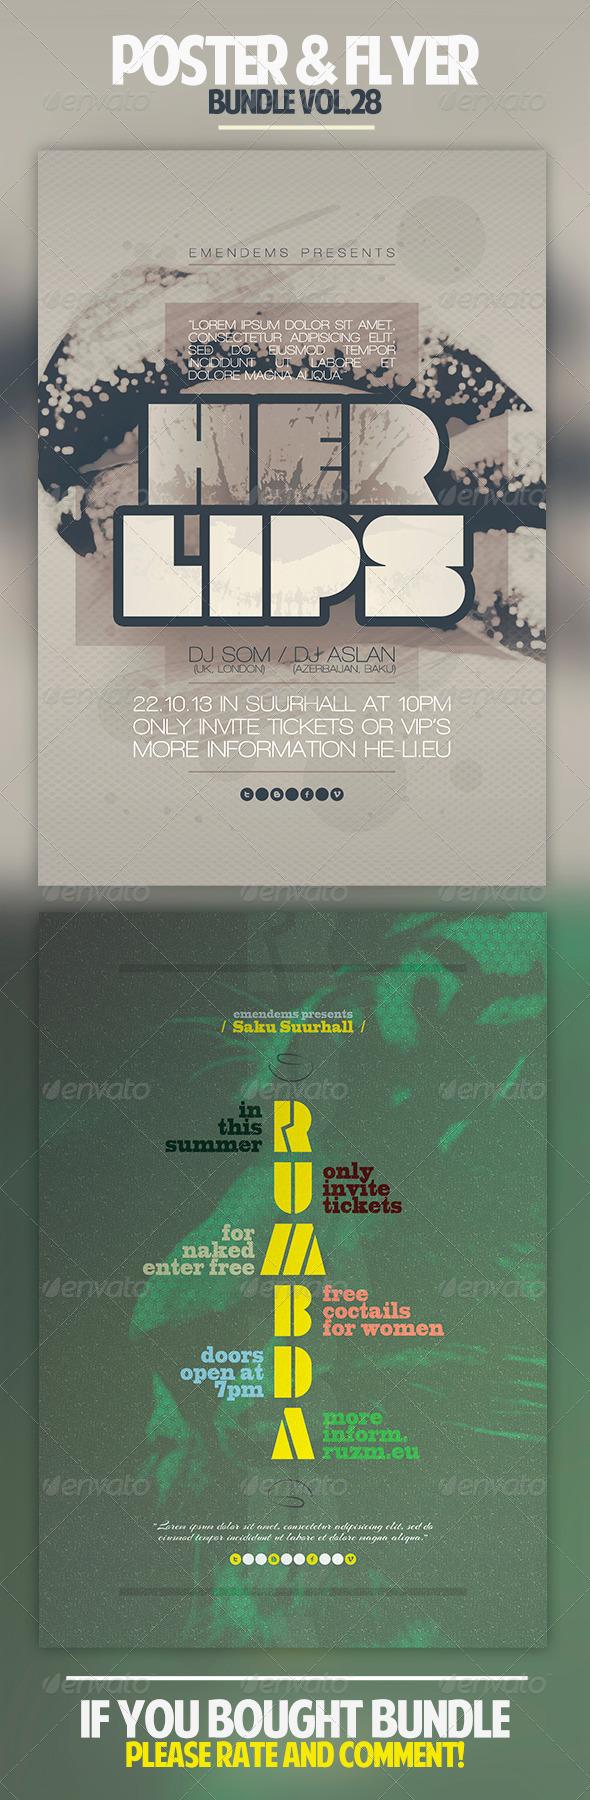 GraphicRiver Poster & Flyer Bundle Vol.28 7010635